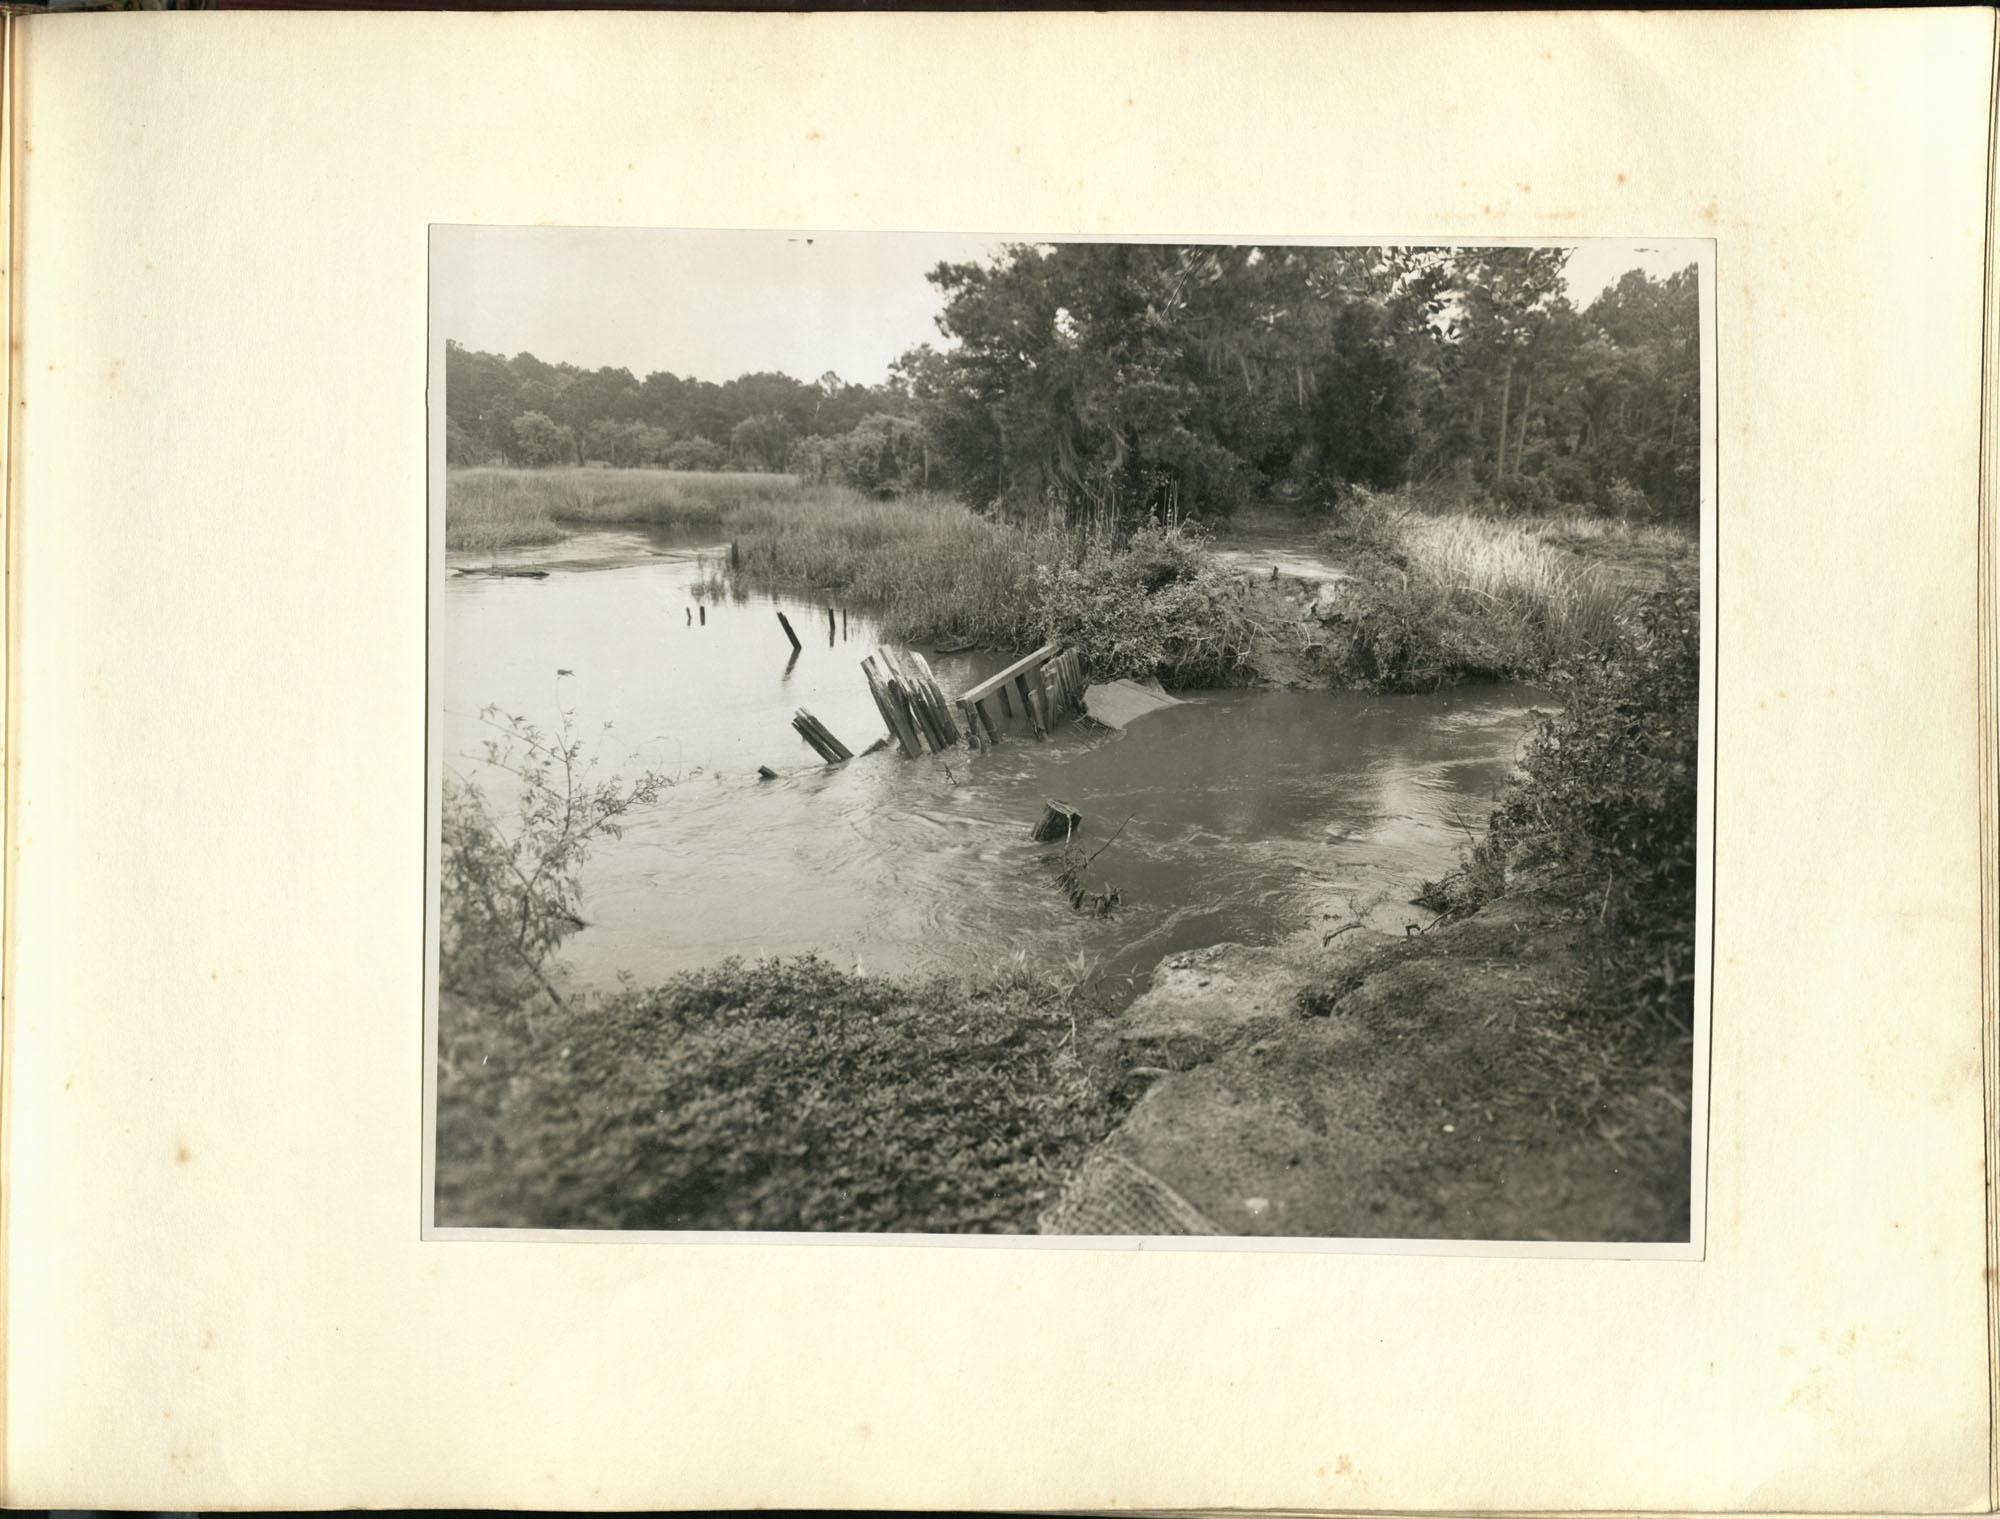 Medway Plantation Photograph Album, 1949, page 141